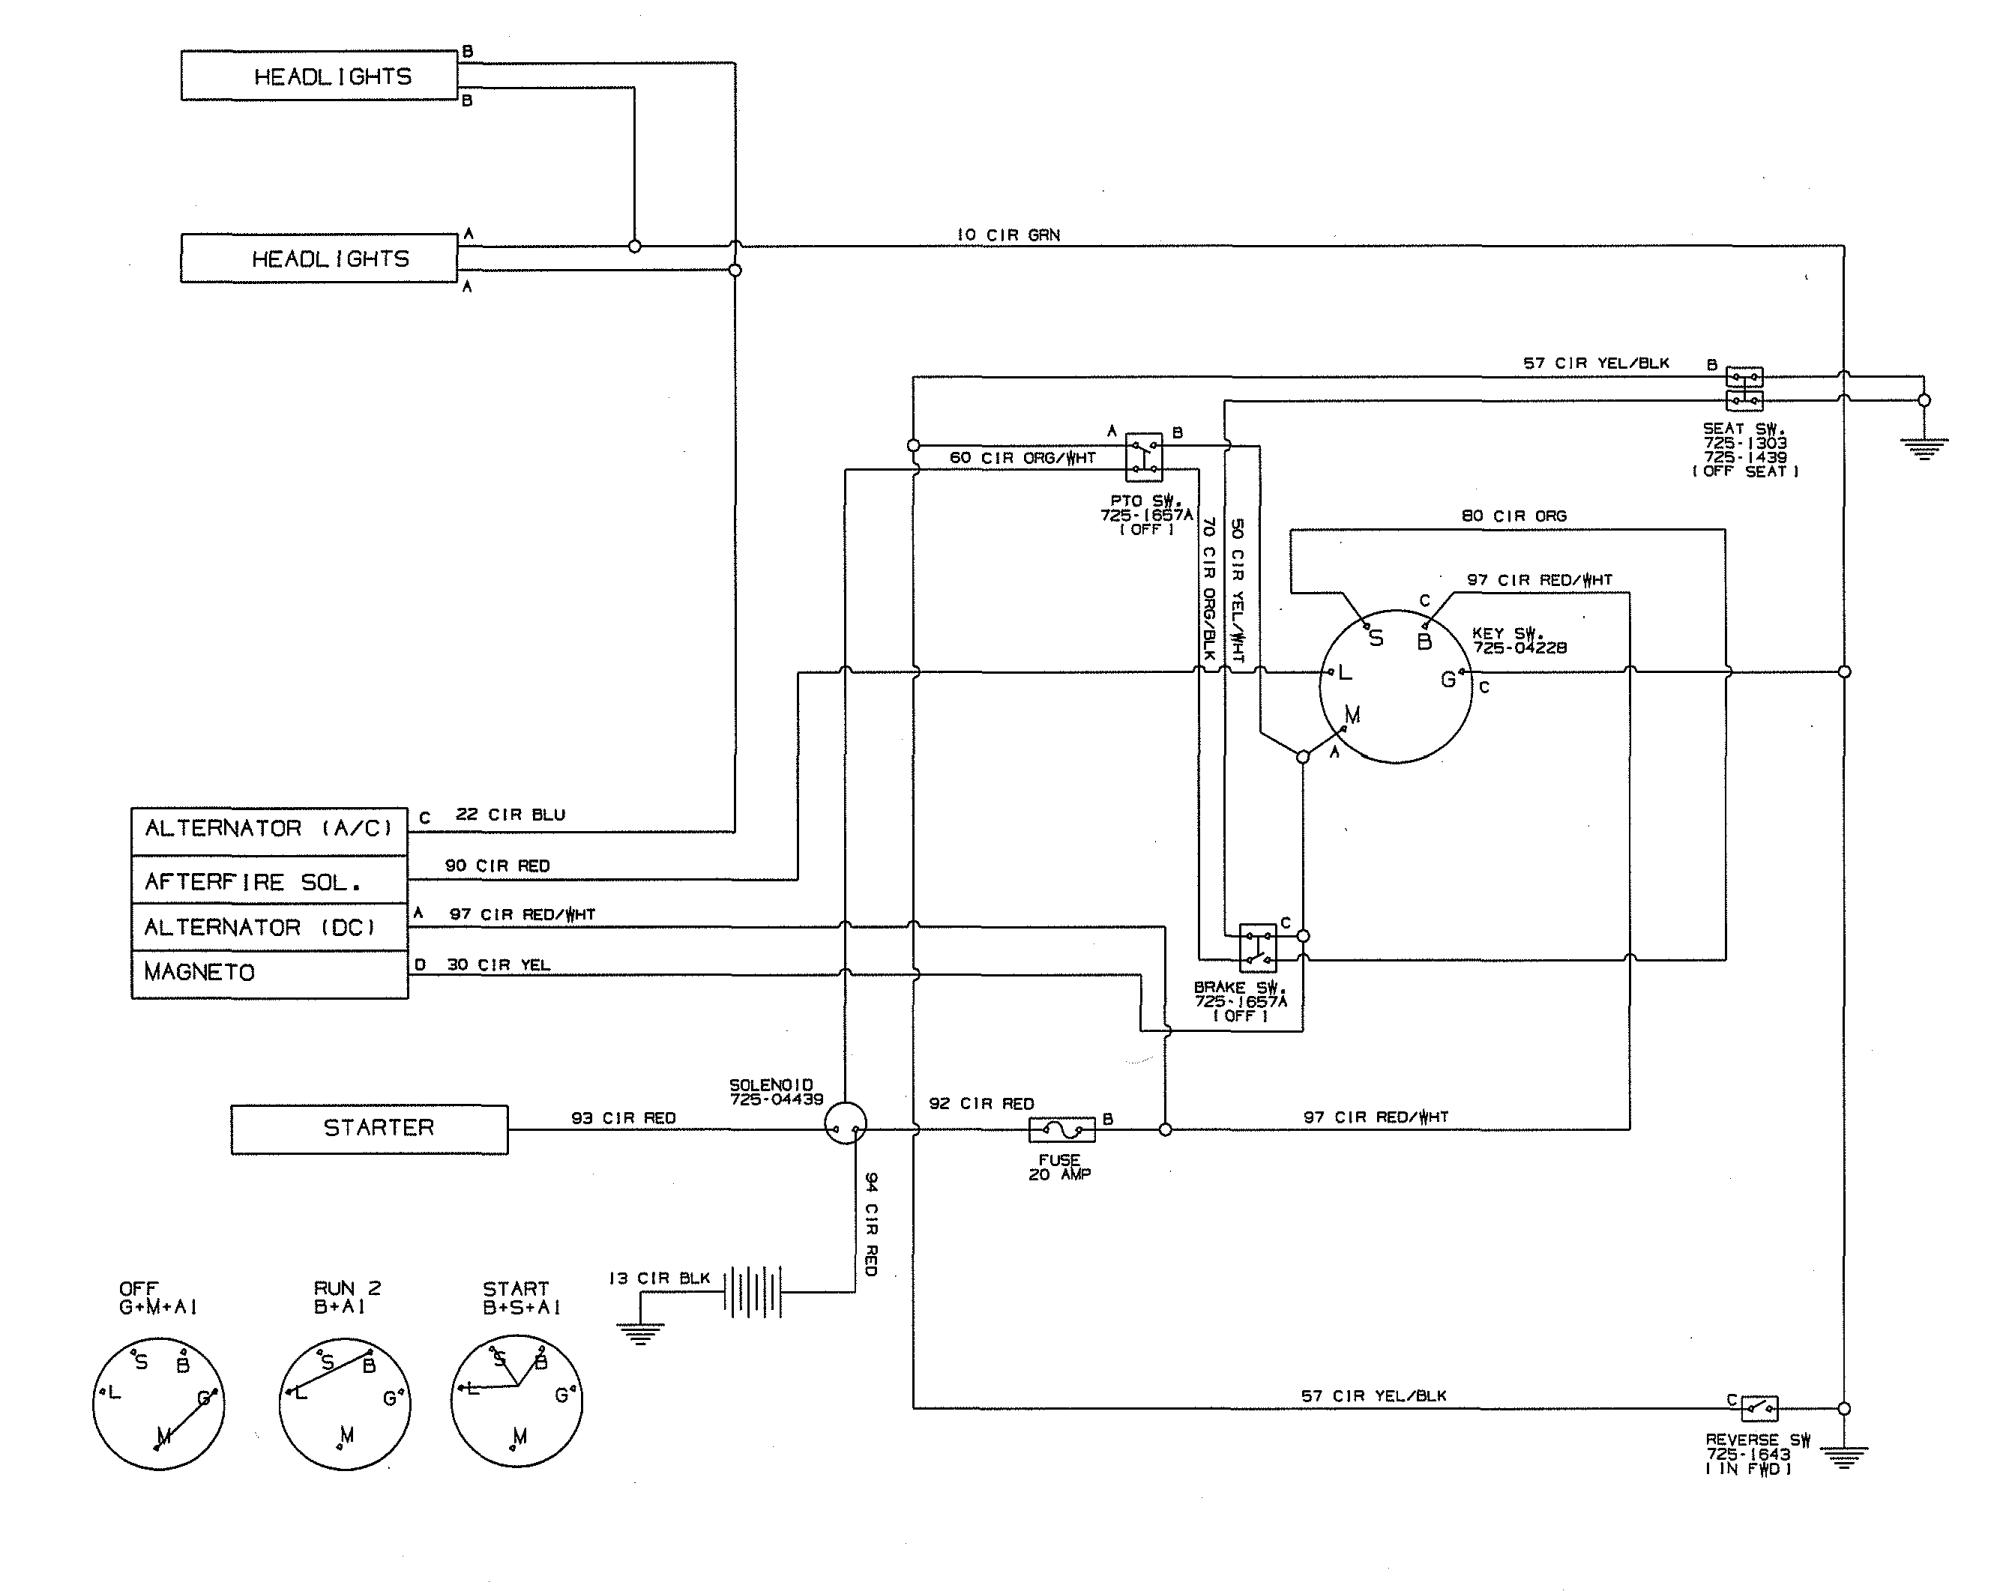 hight resolution of troy bilt mower wiring diagram wiring diagram name troy bilt pony mower wiring diagram troy bilt